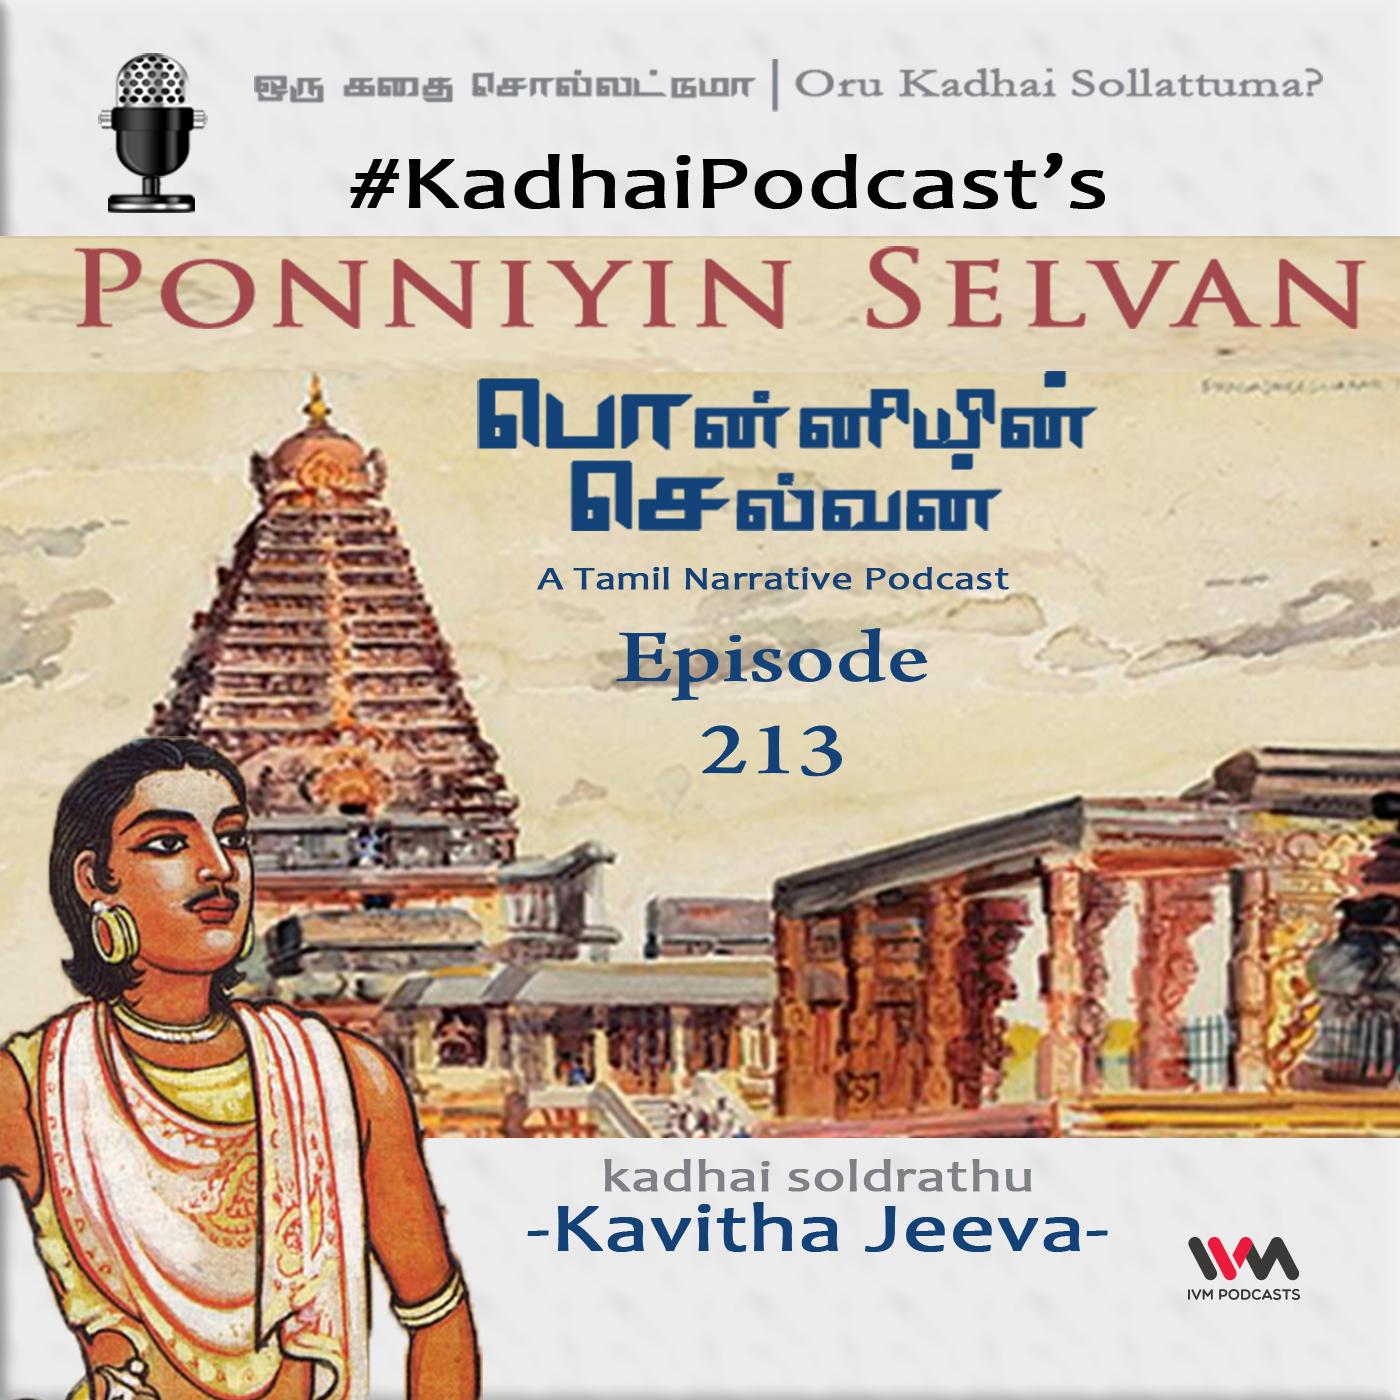 KadhaiPodcast's Ponniyin Selvan - Episode # 213